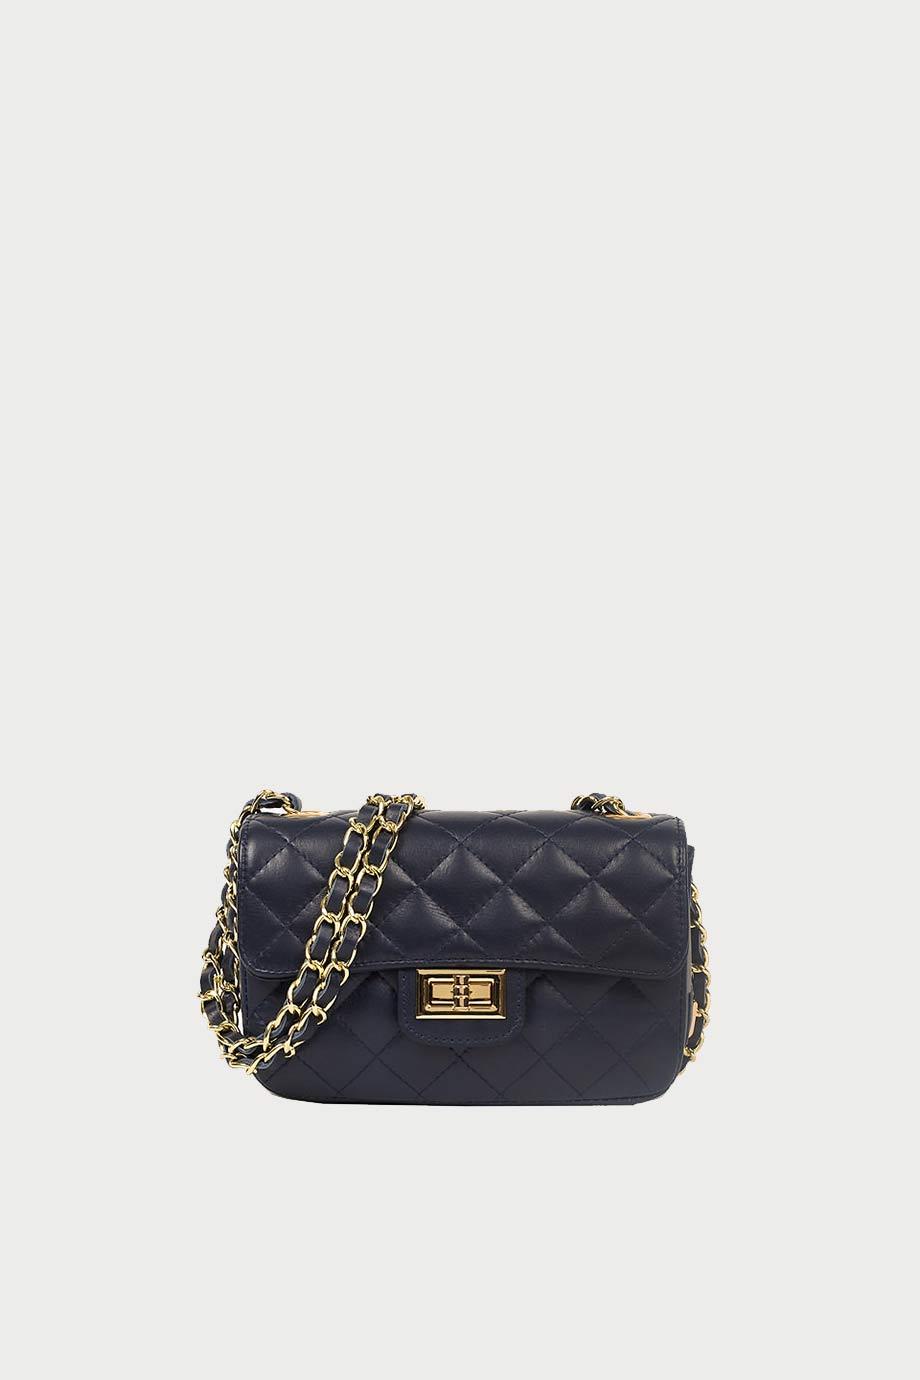 spiridoula metheniti shoes xalkida p ss17 7105 black side bag leather chain 19v69